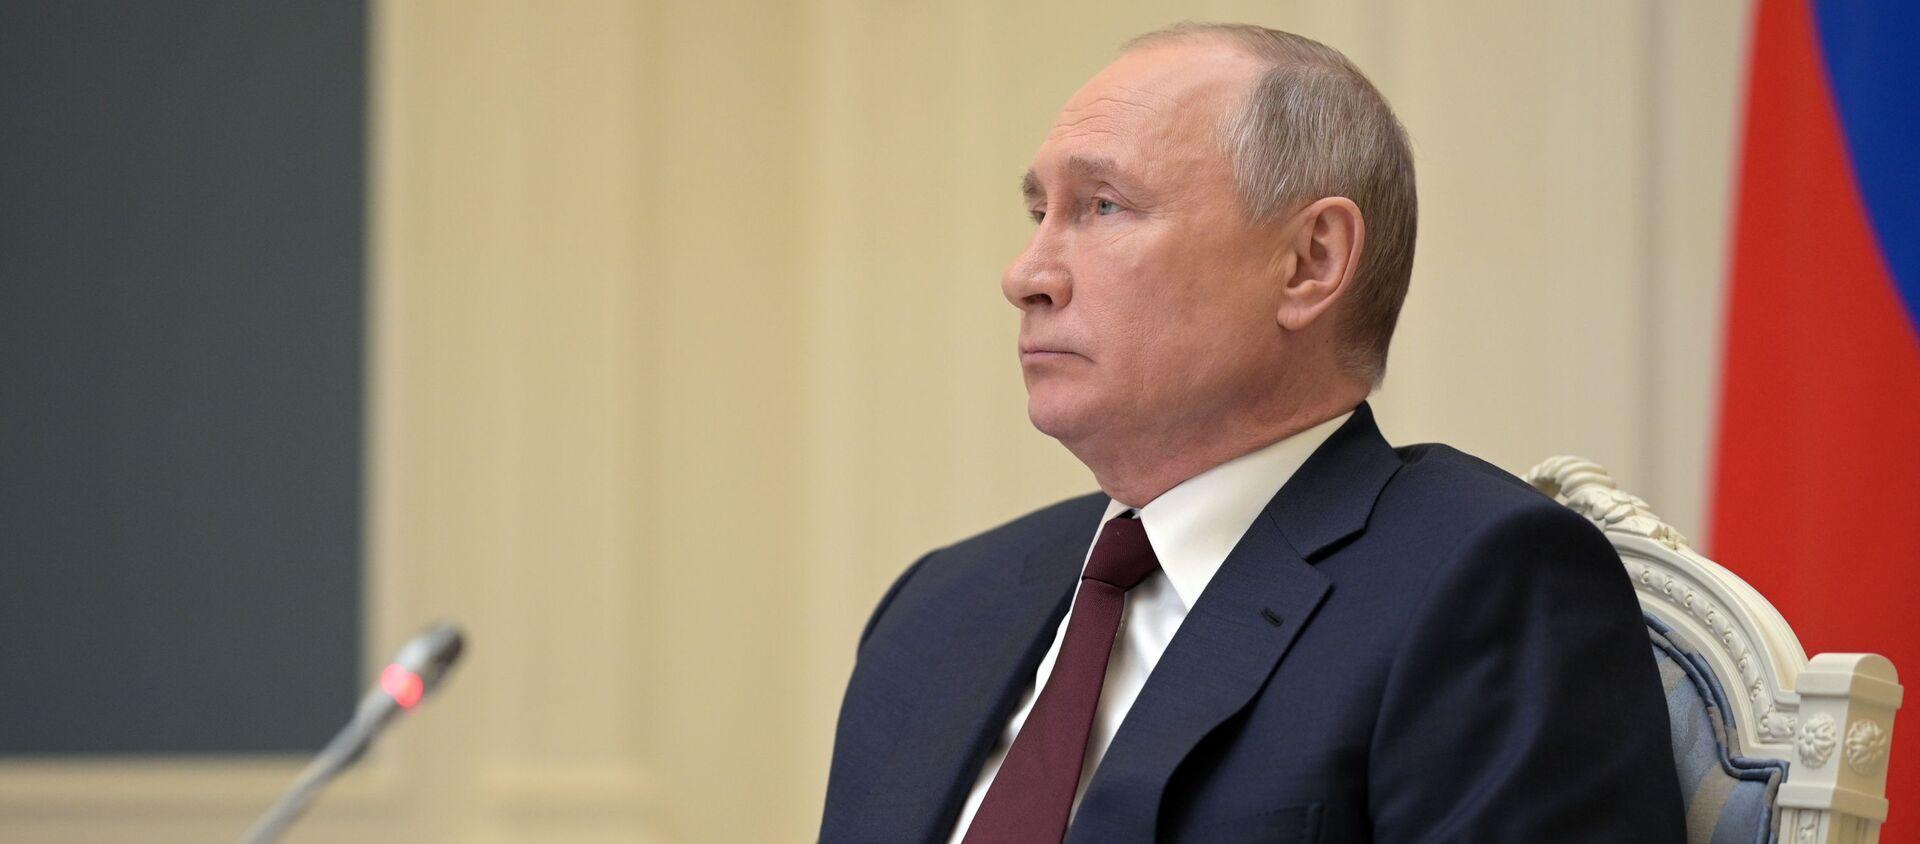 Президент РФ Владимир Путин - Sputnik Беларусь, 1920, 22.04.2021